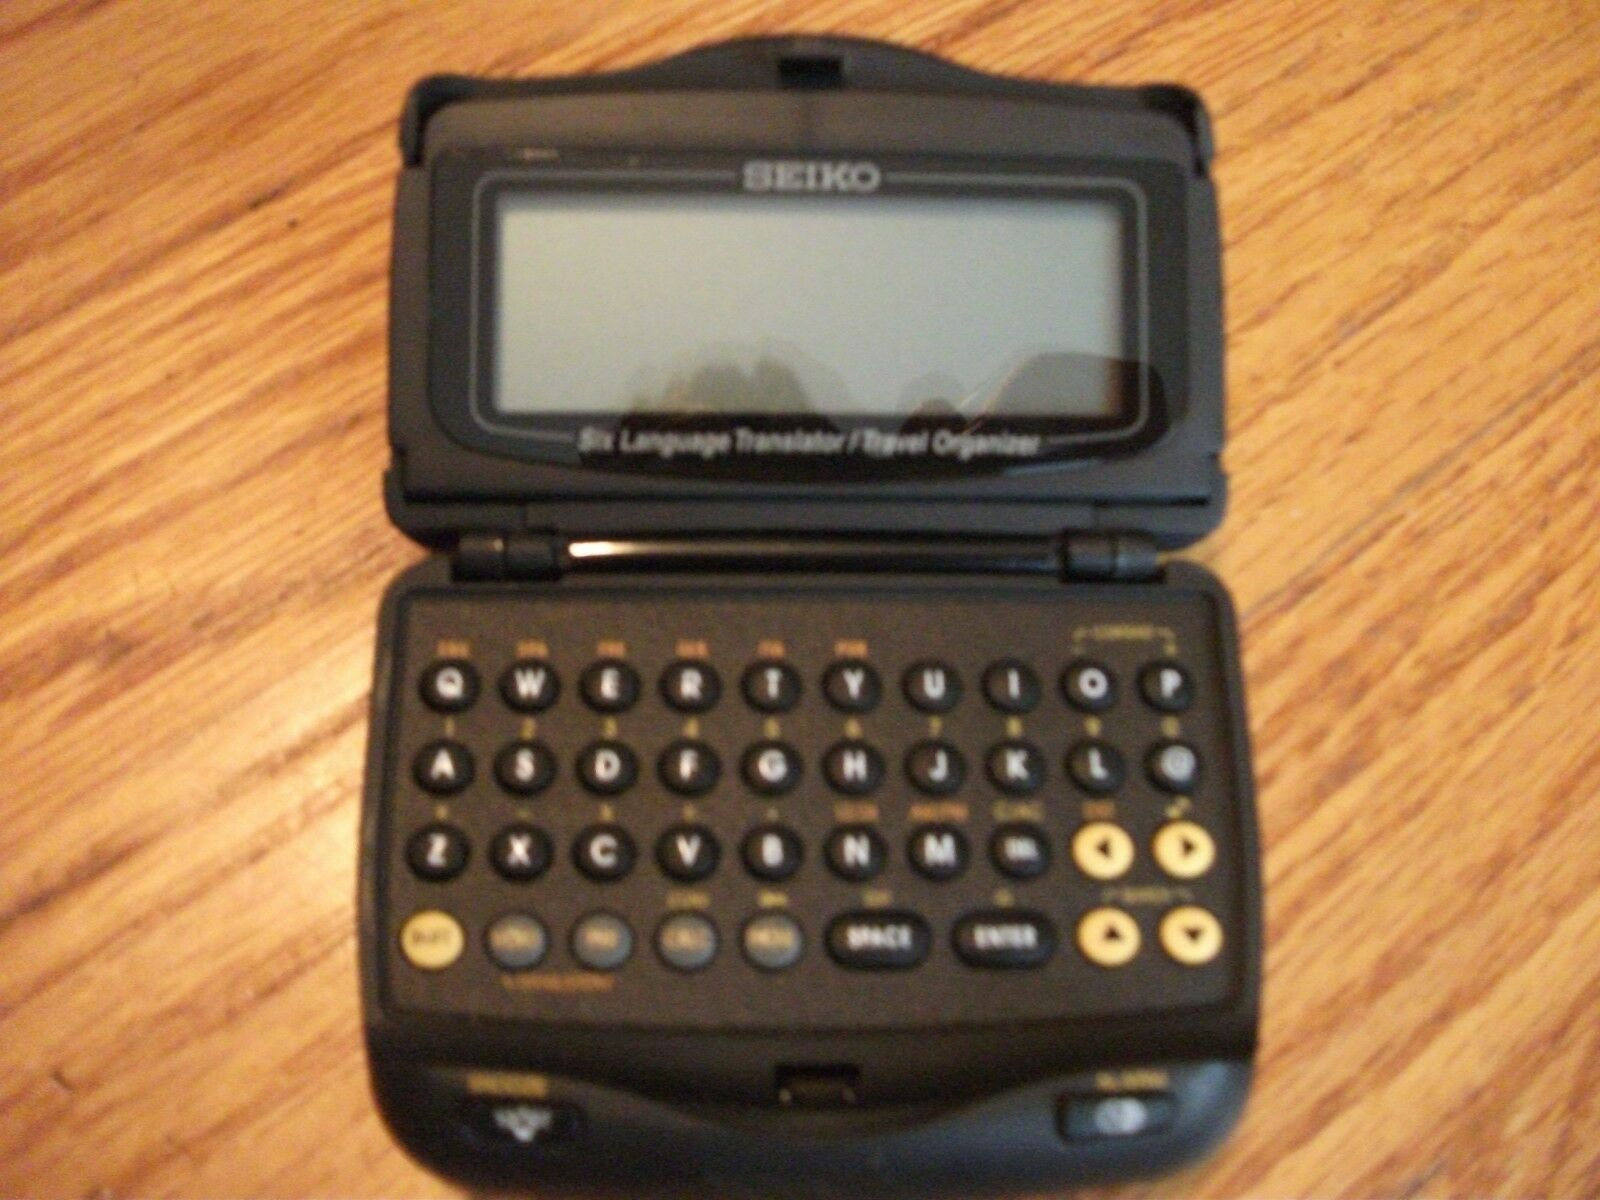 Seiko Model DF4033 Six-Language Pocket Translator / Travel Organizer    1X1077